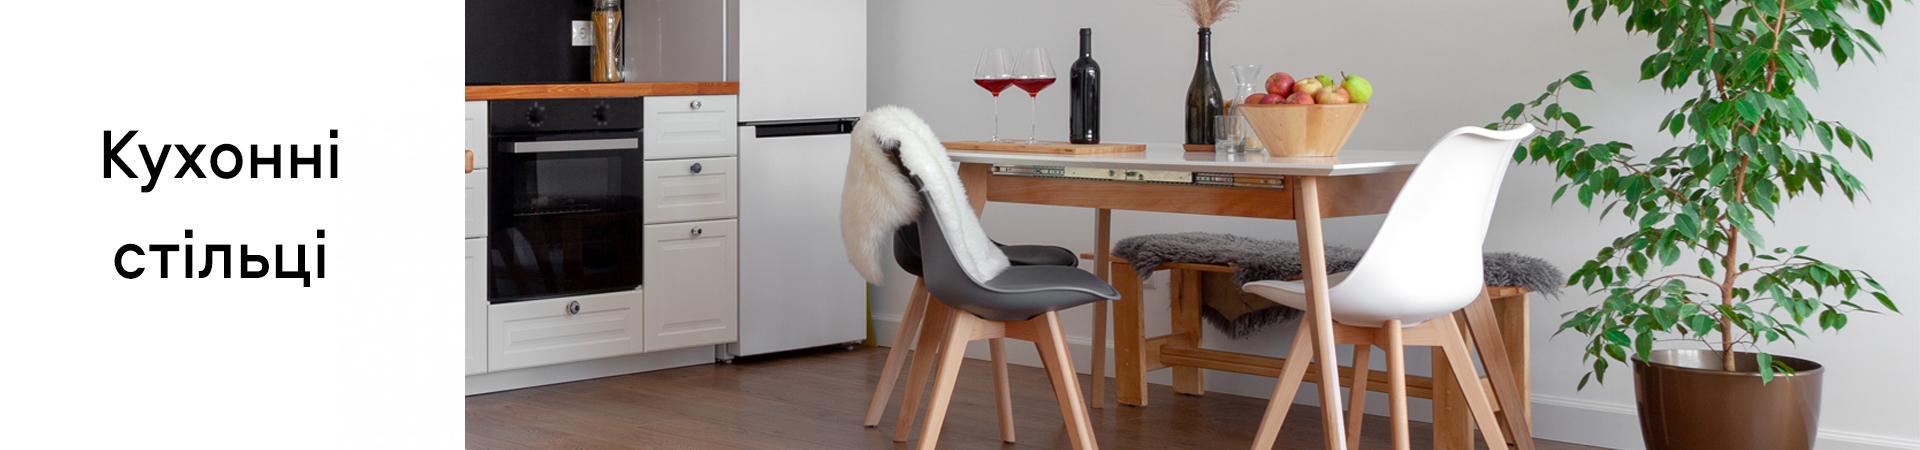 Кухонные стулья Цвет Темно-серый